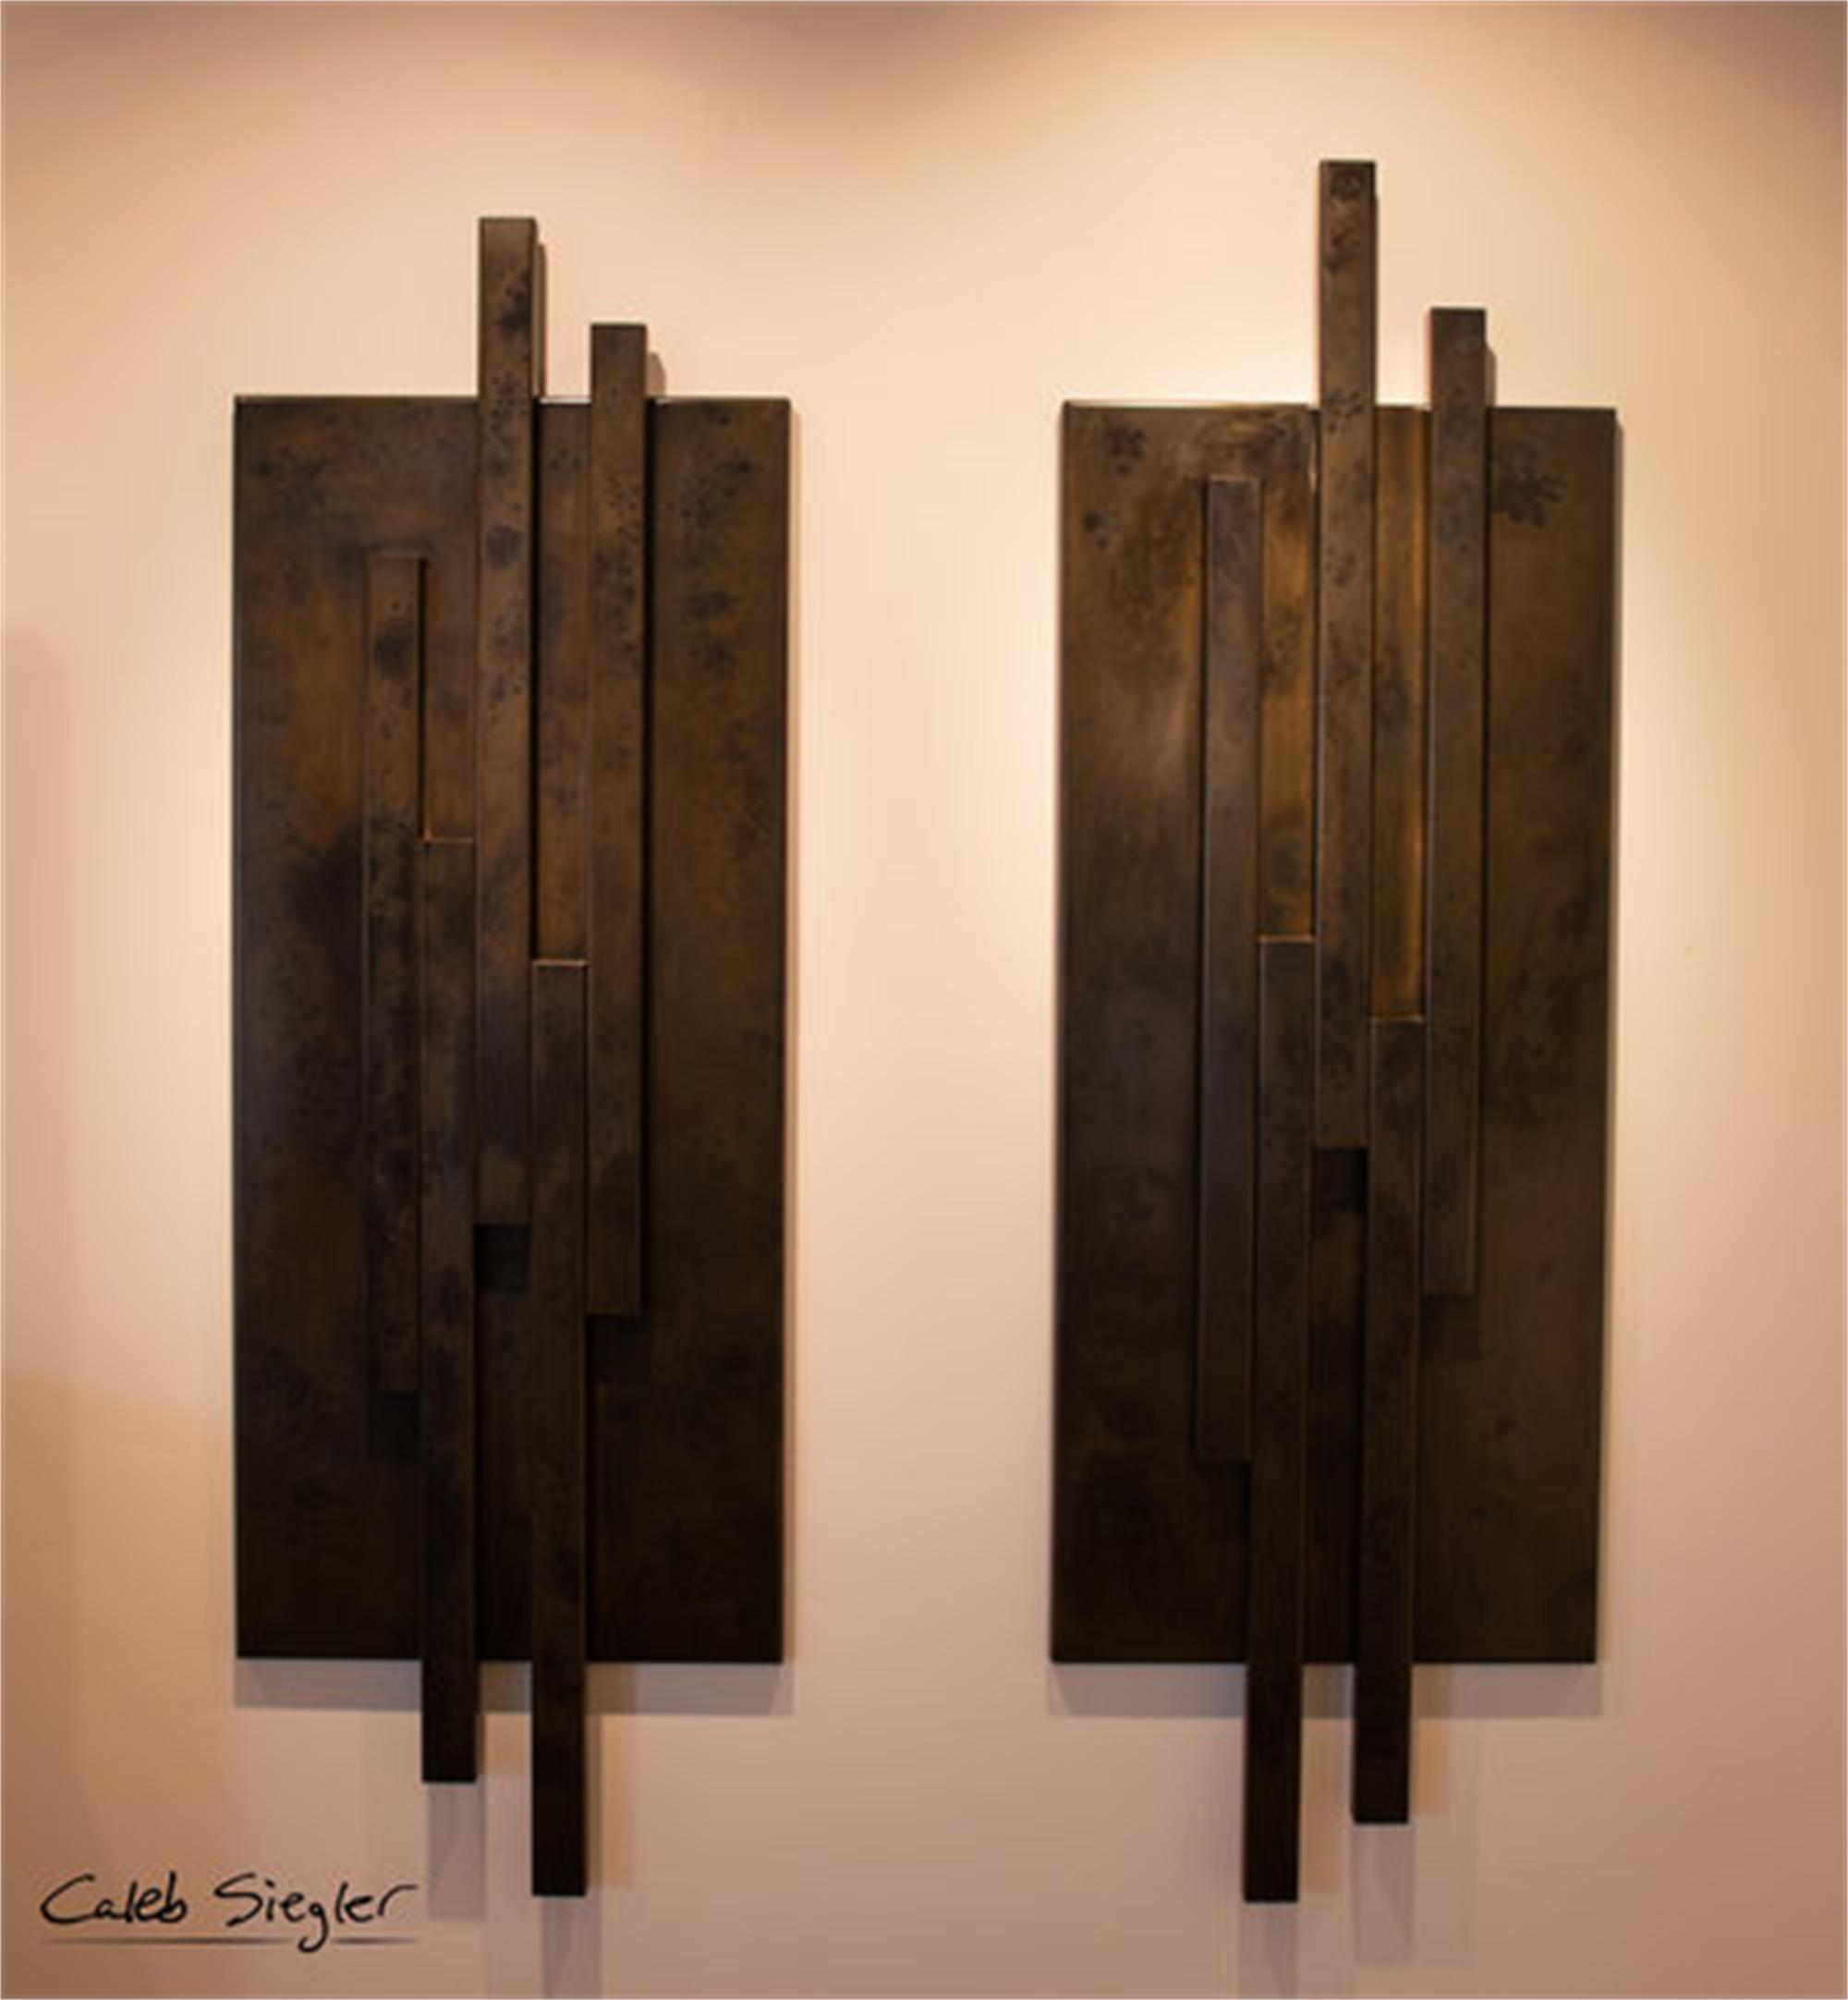 Towers (Diptych) by Caleb Siegler